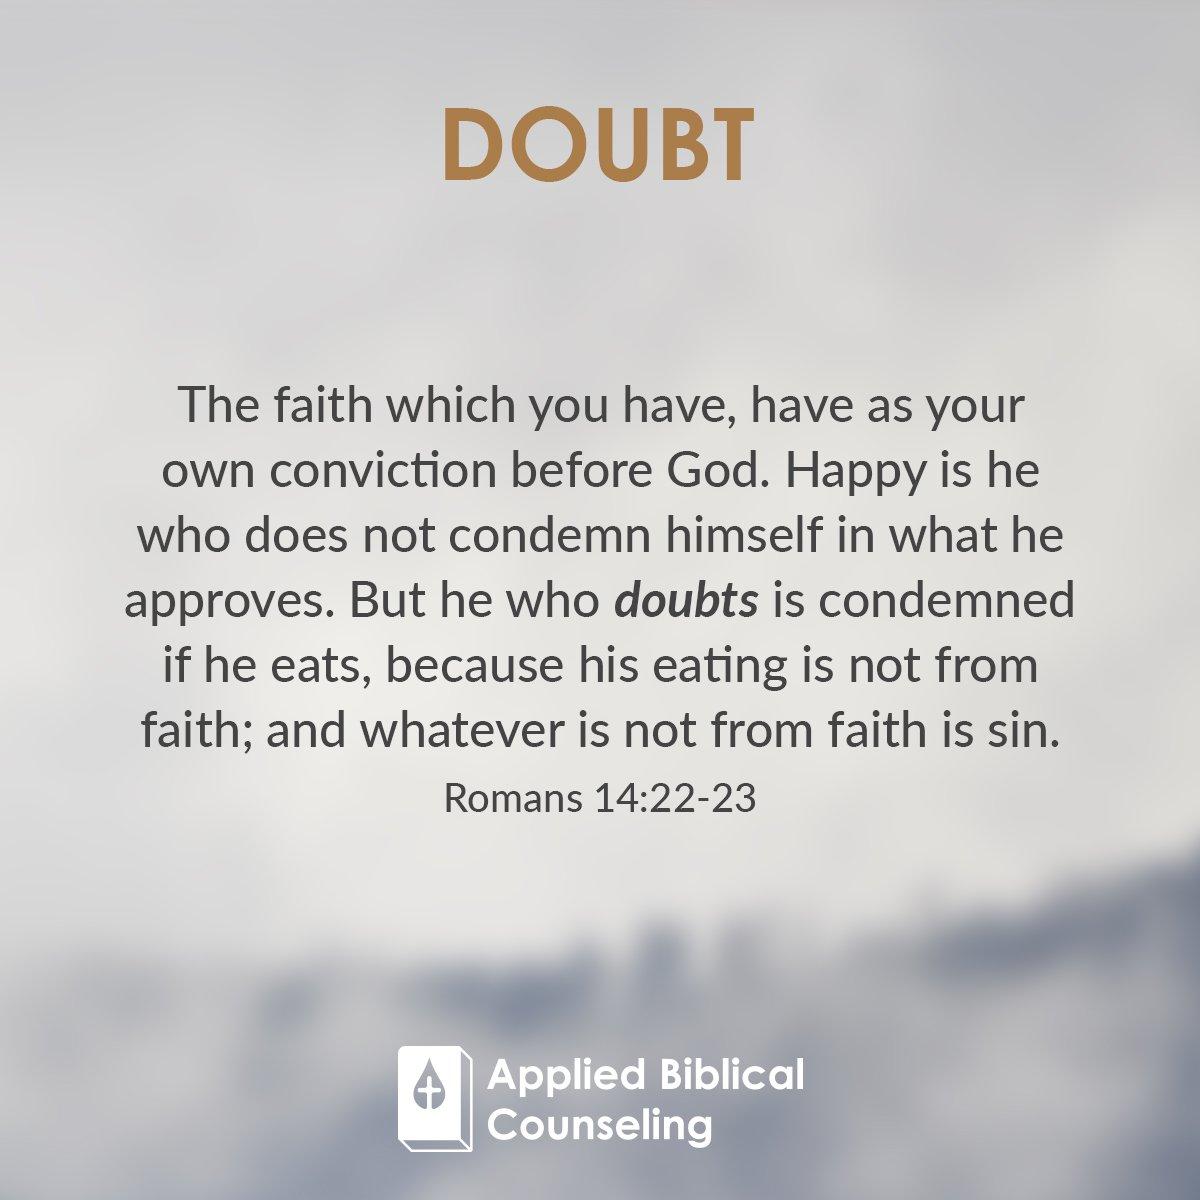 Doubt 3